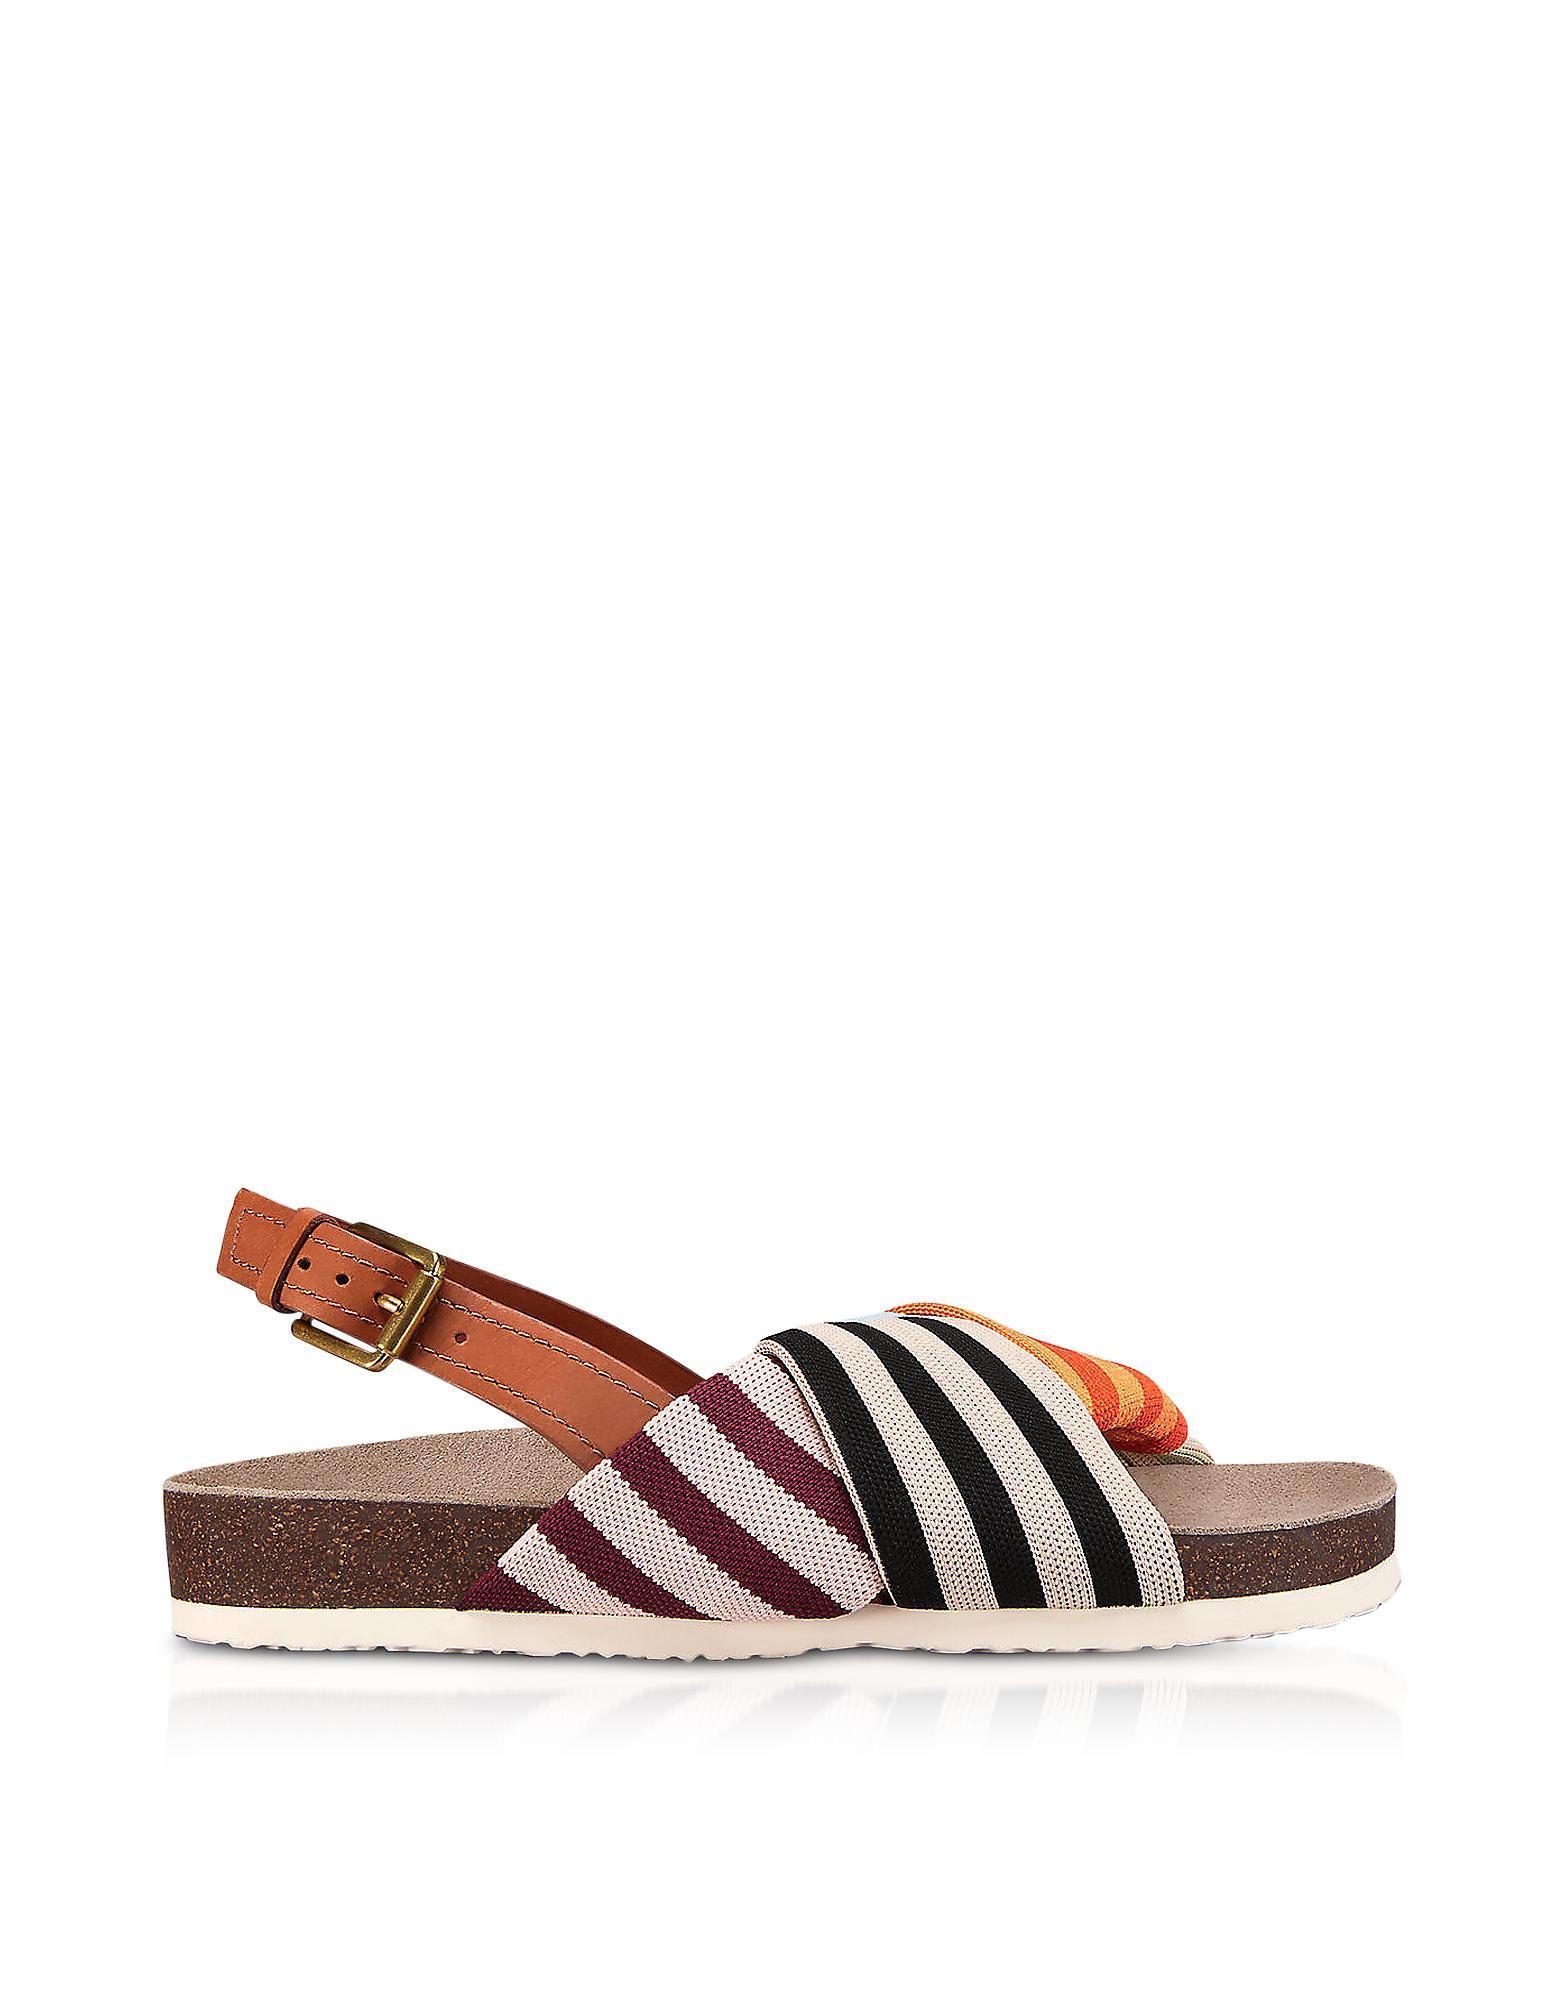 Sale Footlocker Finishline Tory Burch Corey Multi Patchwork Stripe Tech Knit Fabric And Leather Flatform Sandals New Styles vXf2hH4wj